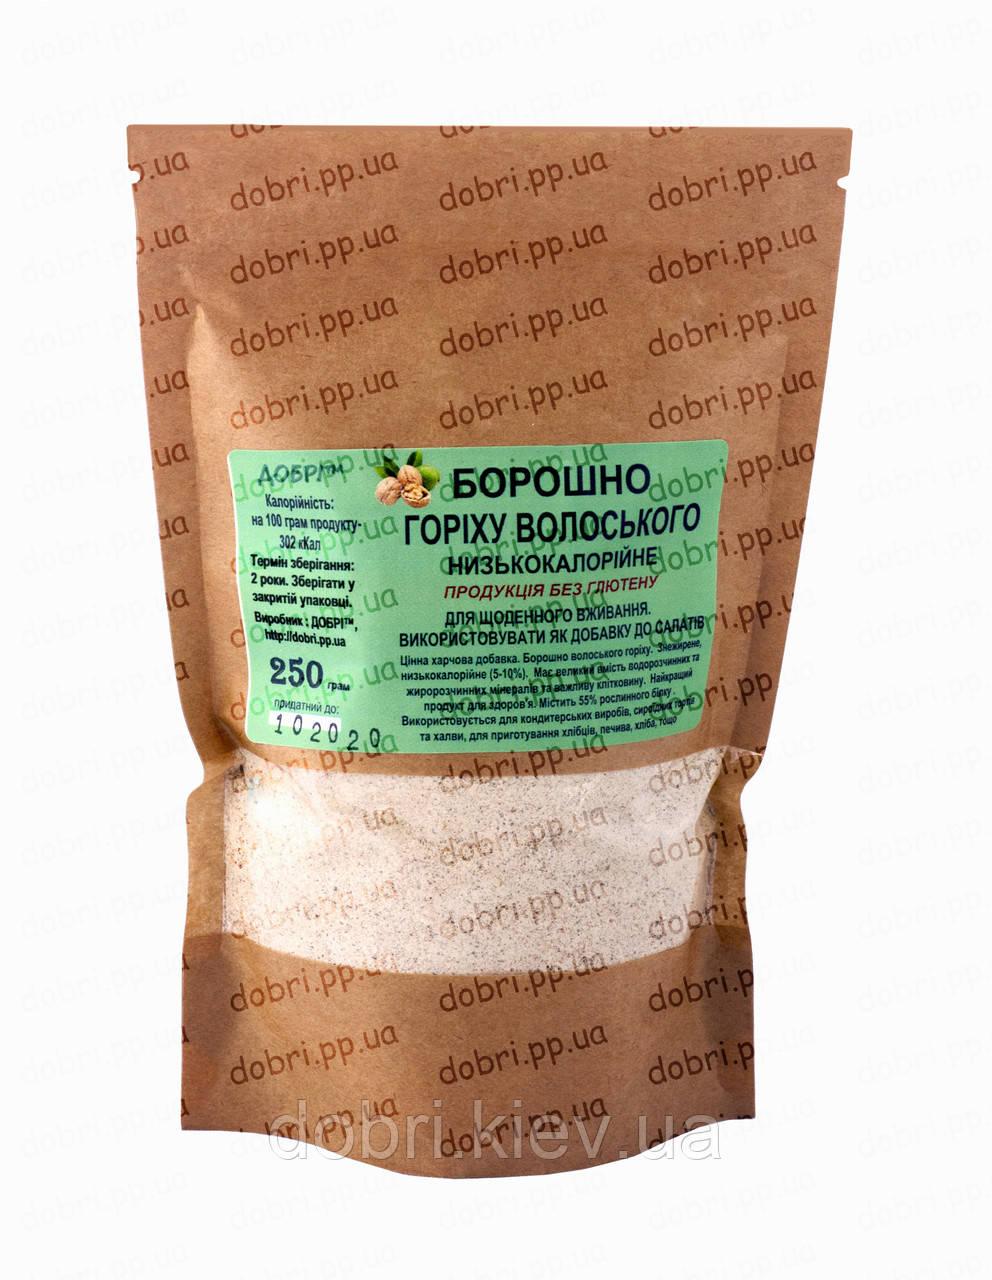 Мука грецкого ореха (250 гр)